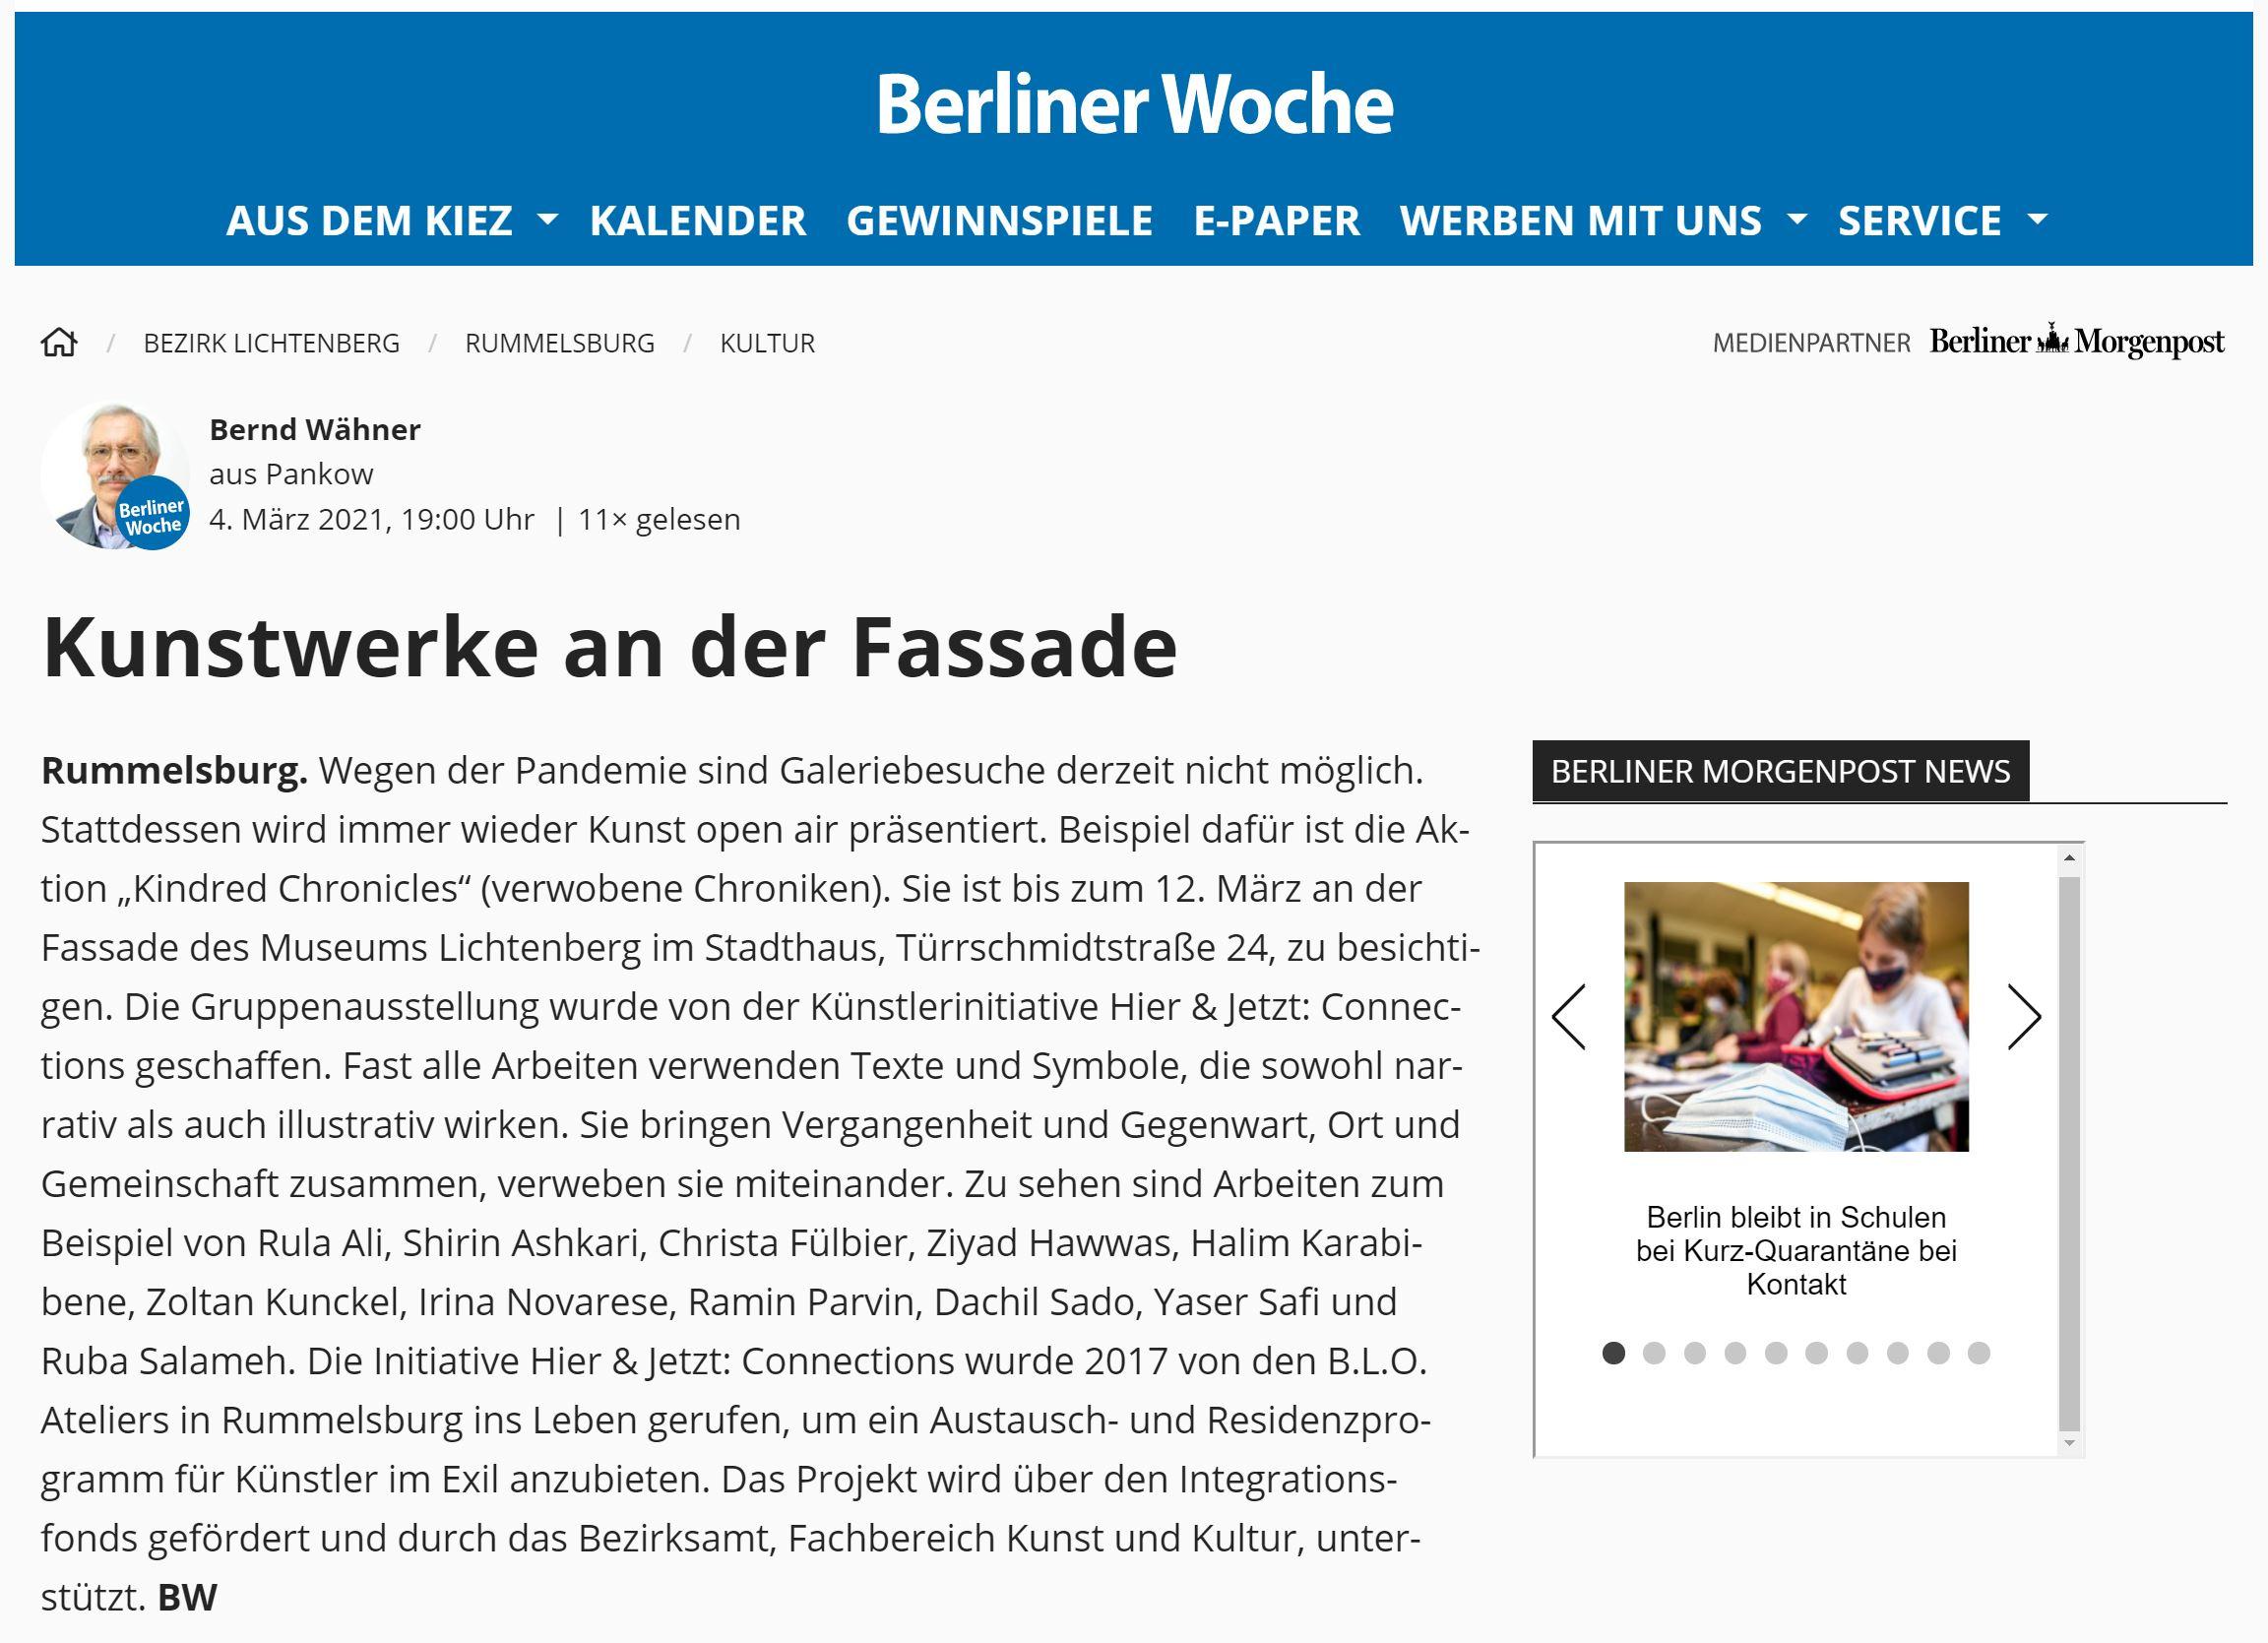 Berliner Woche 04.03.21 Kunstwerke an der Fassade des Museums Lichtenberg